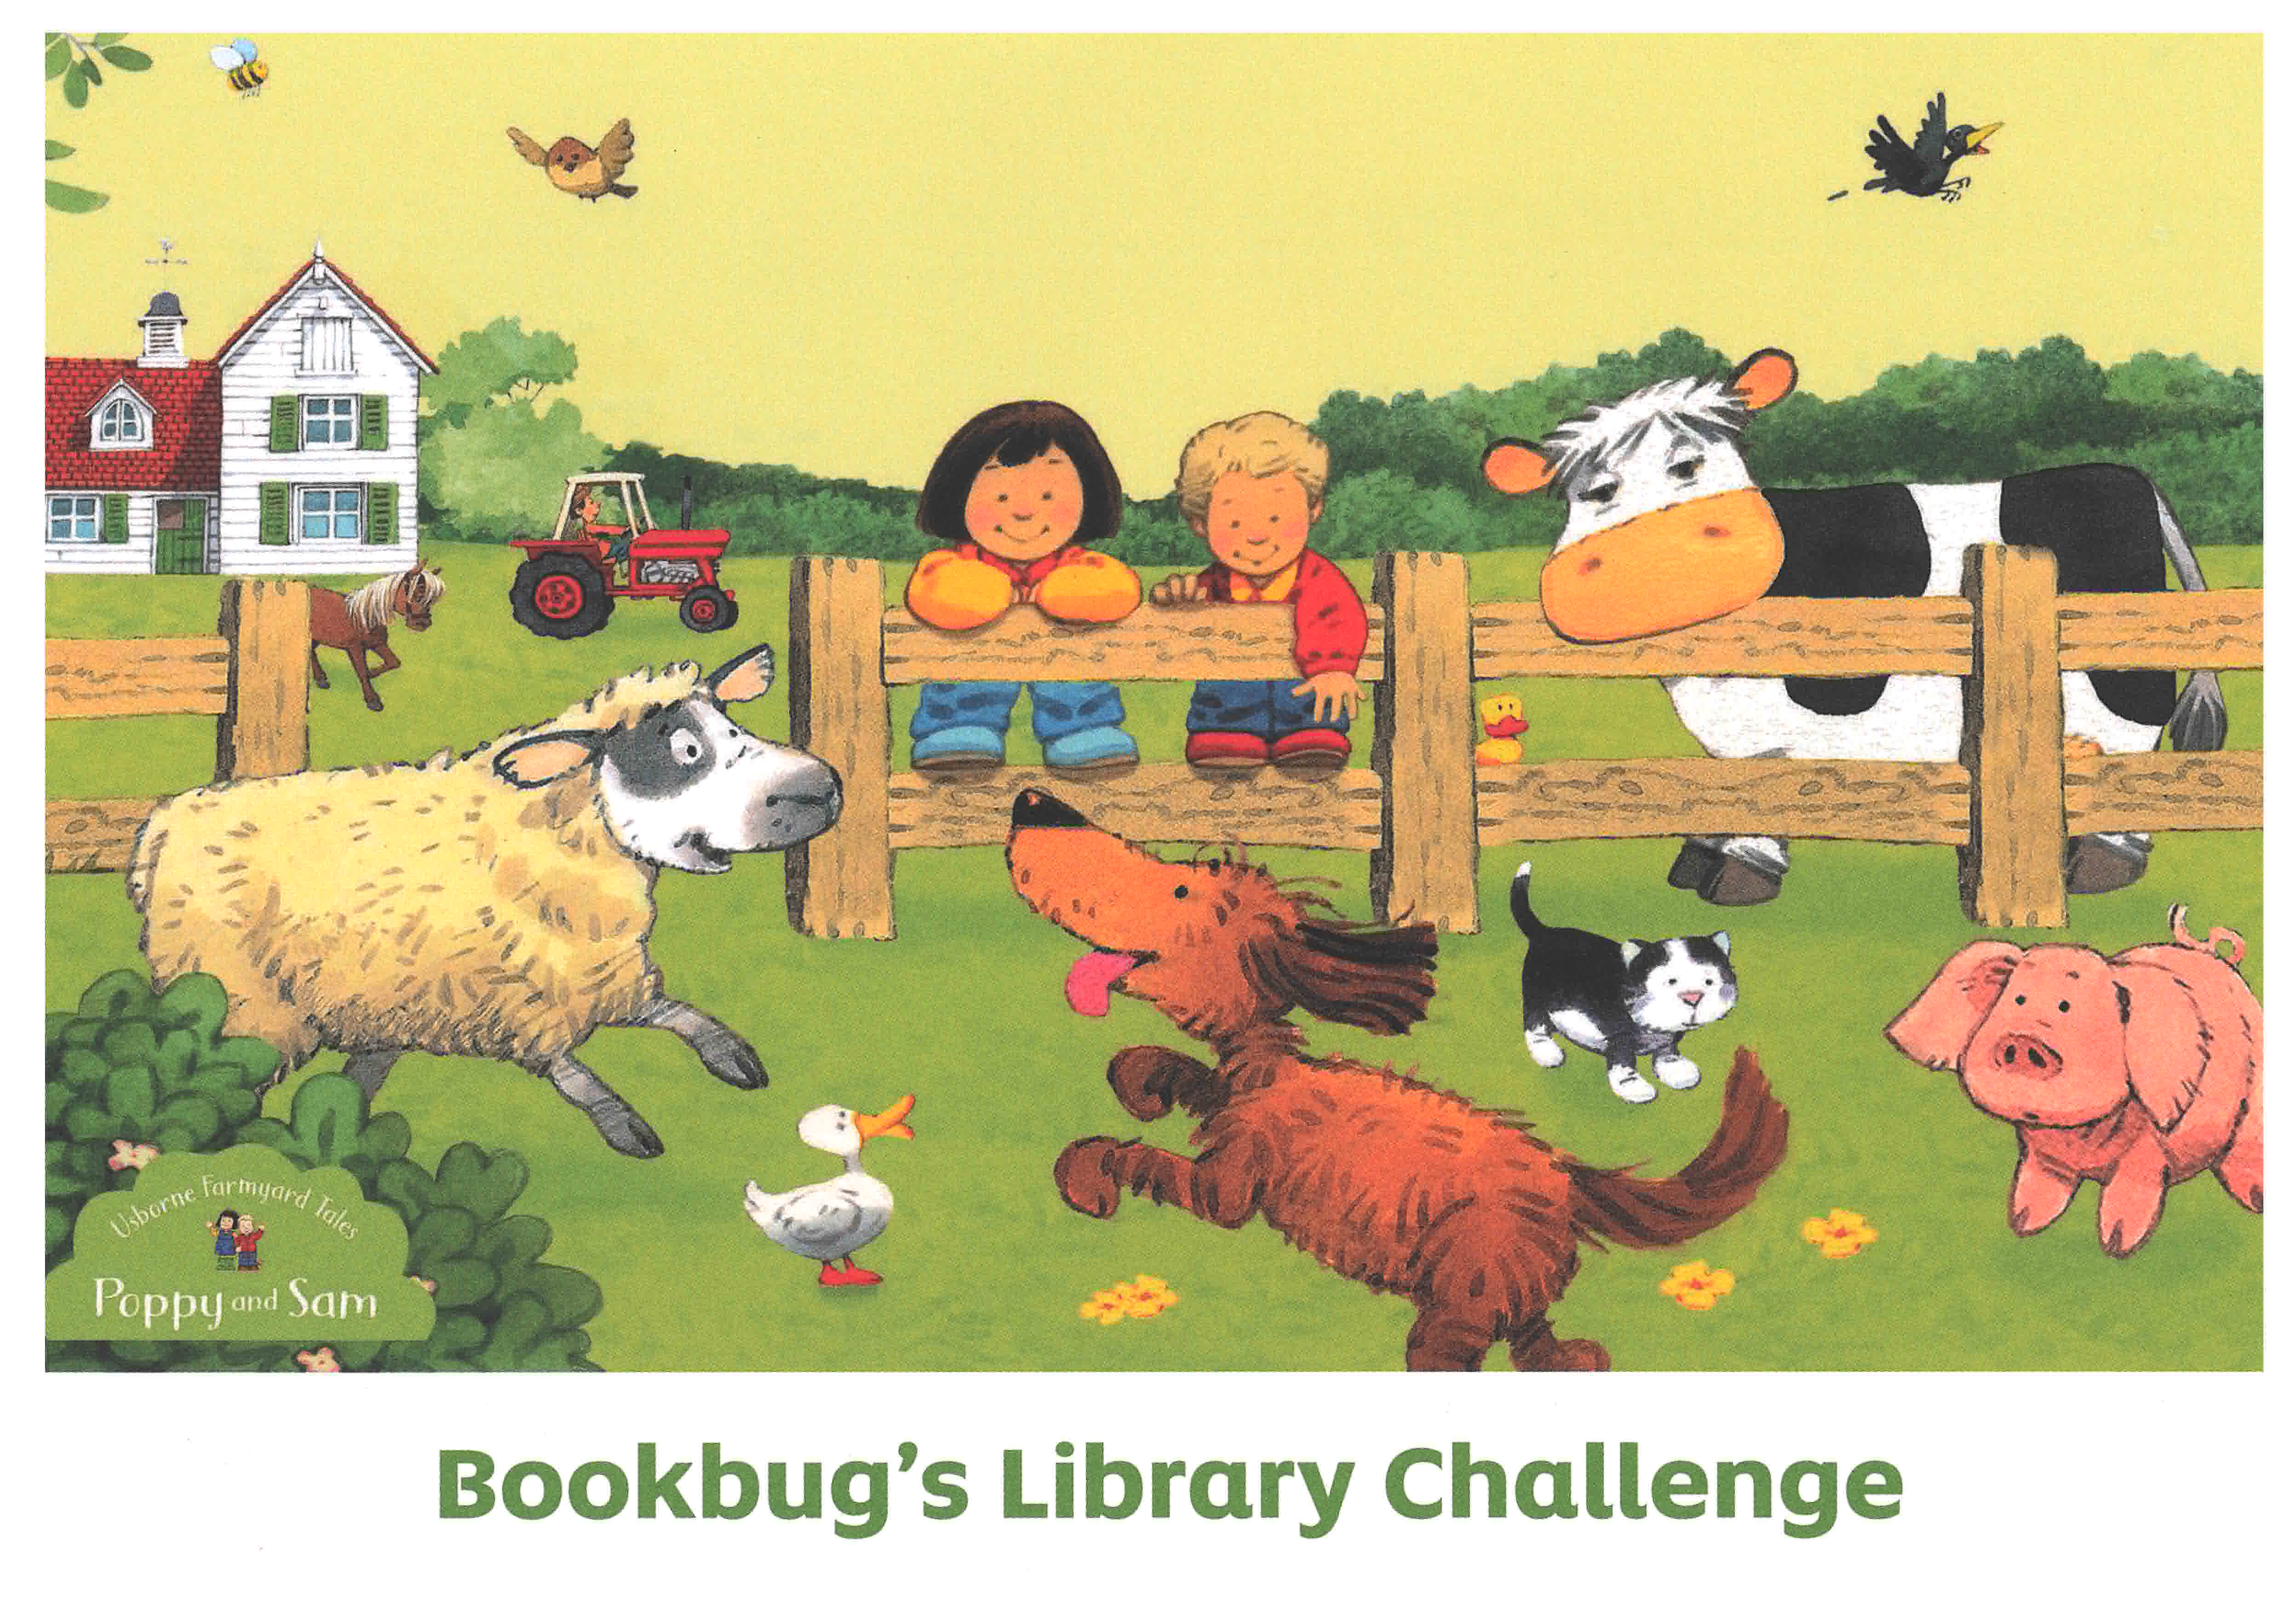 Bookbug's Library Challenge certificate